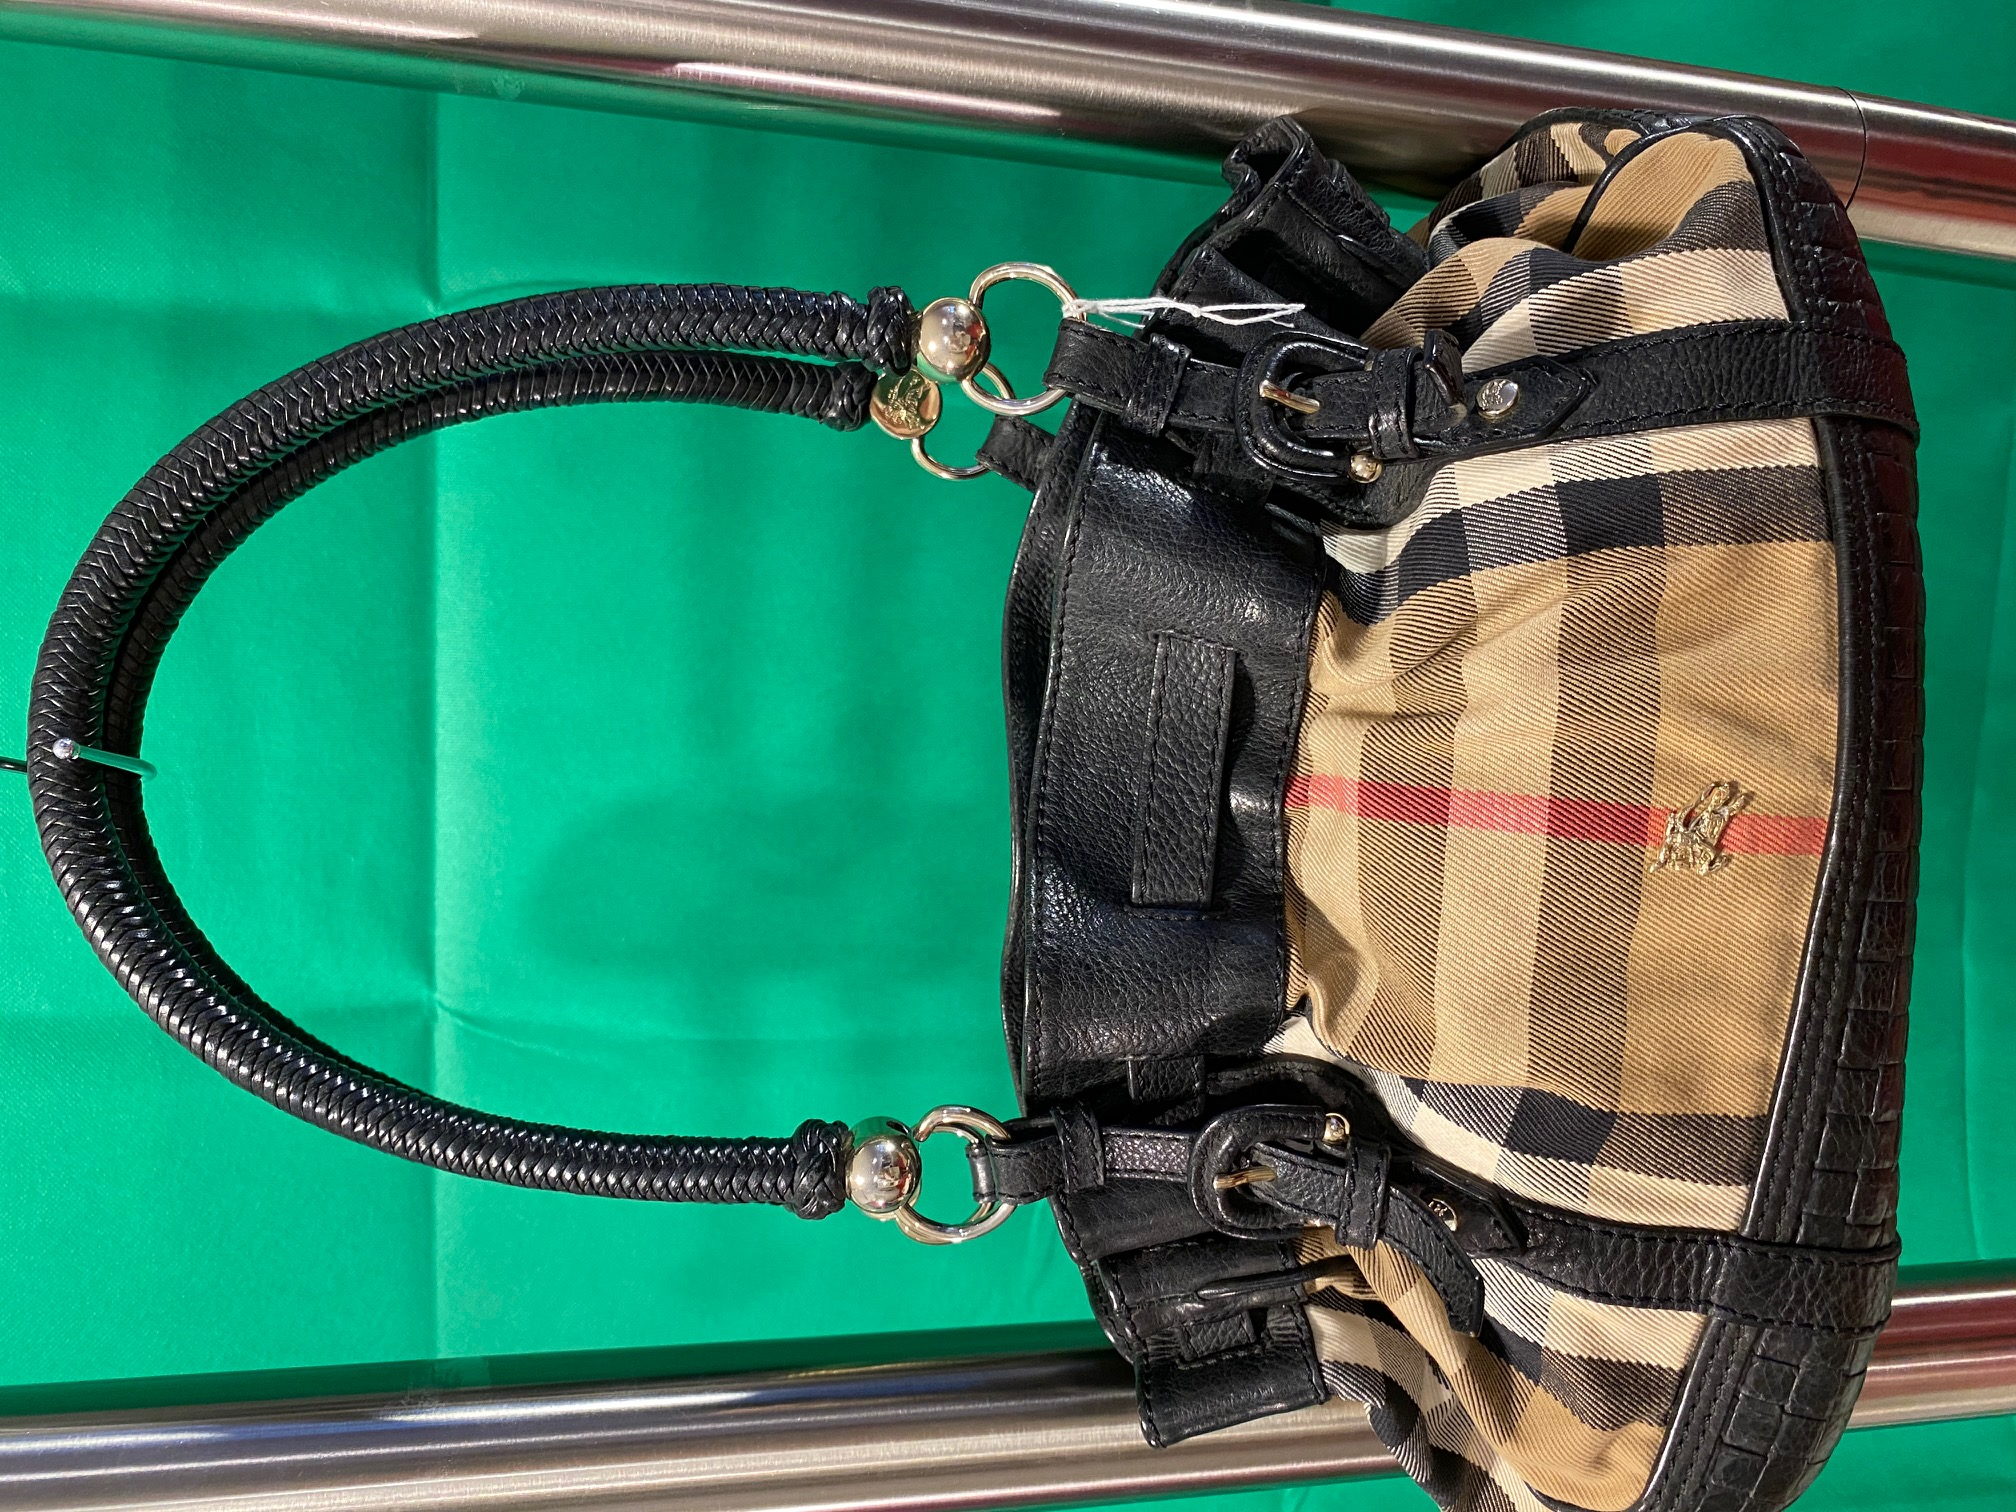 Original Burbery Tasche Neupreis 1000,-